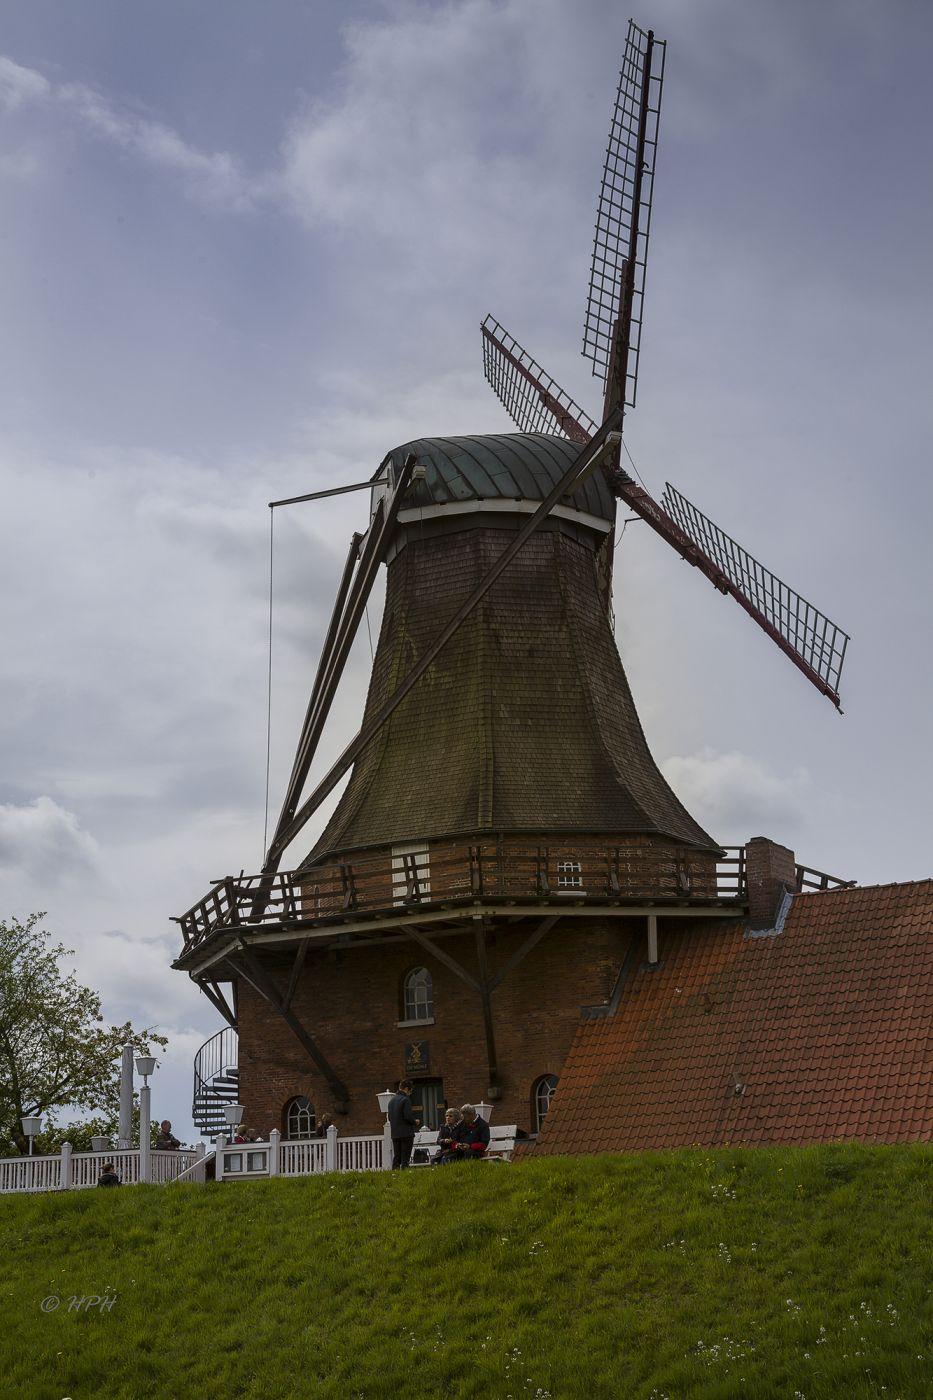 Windmill 'Aurora' in Jork-Borstel, Germany